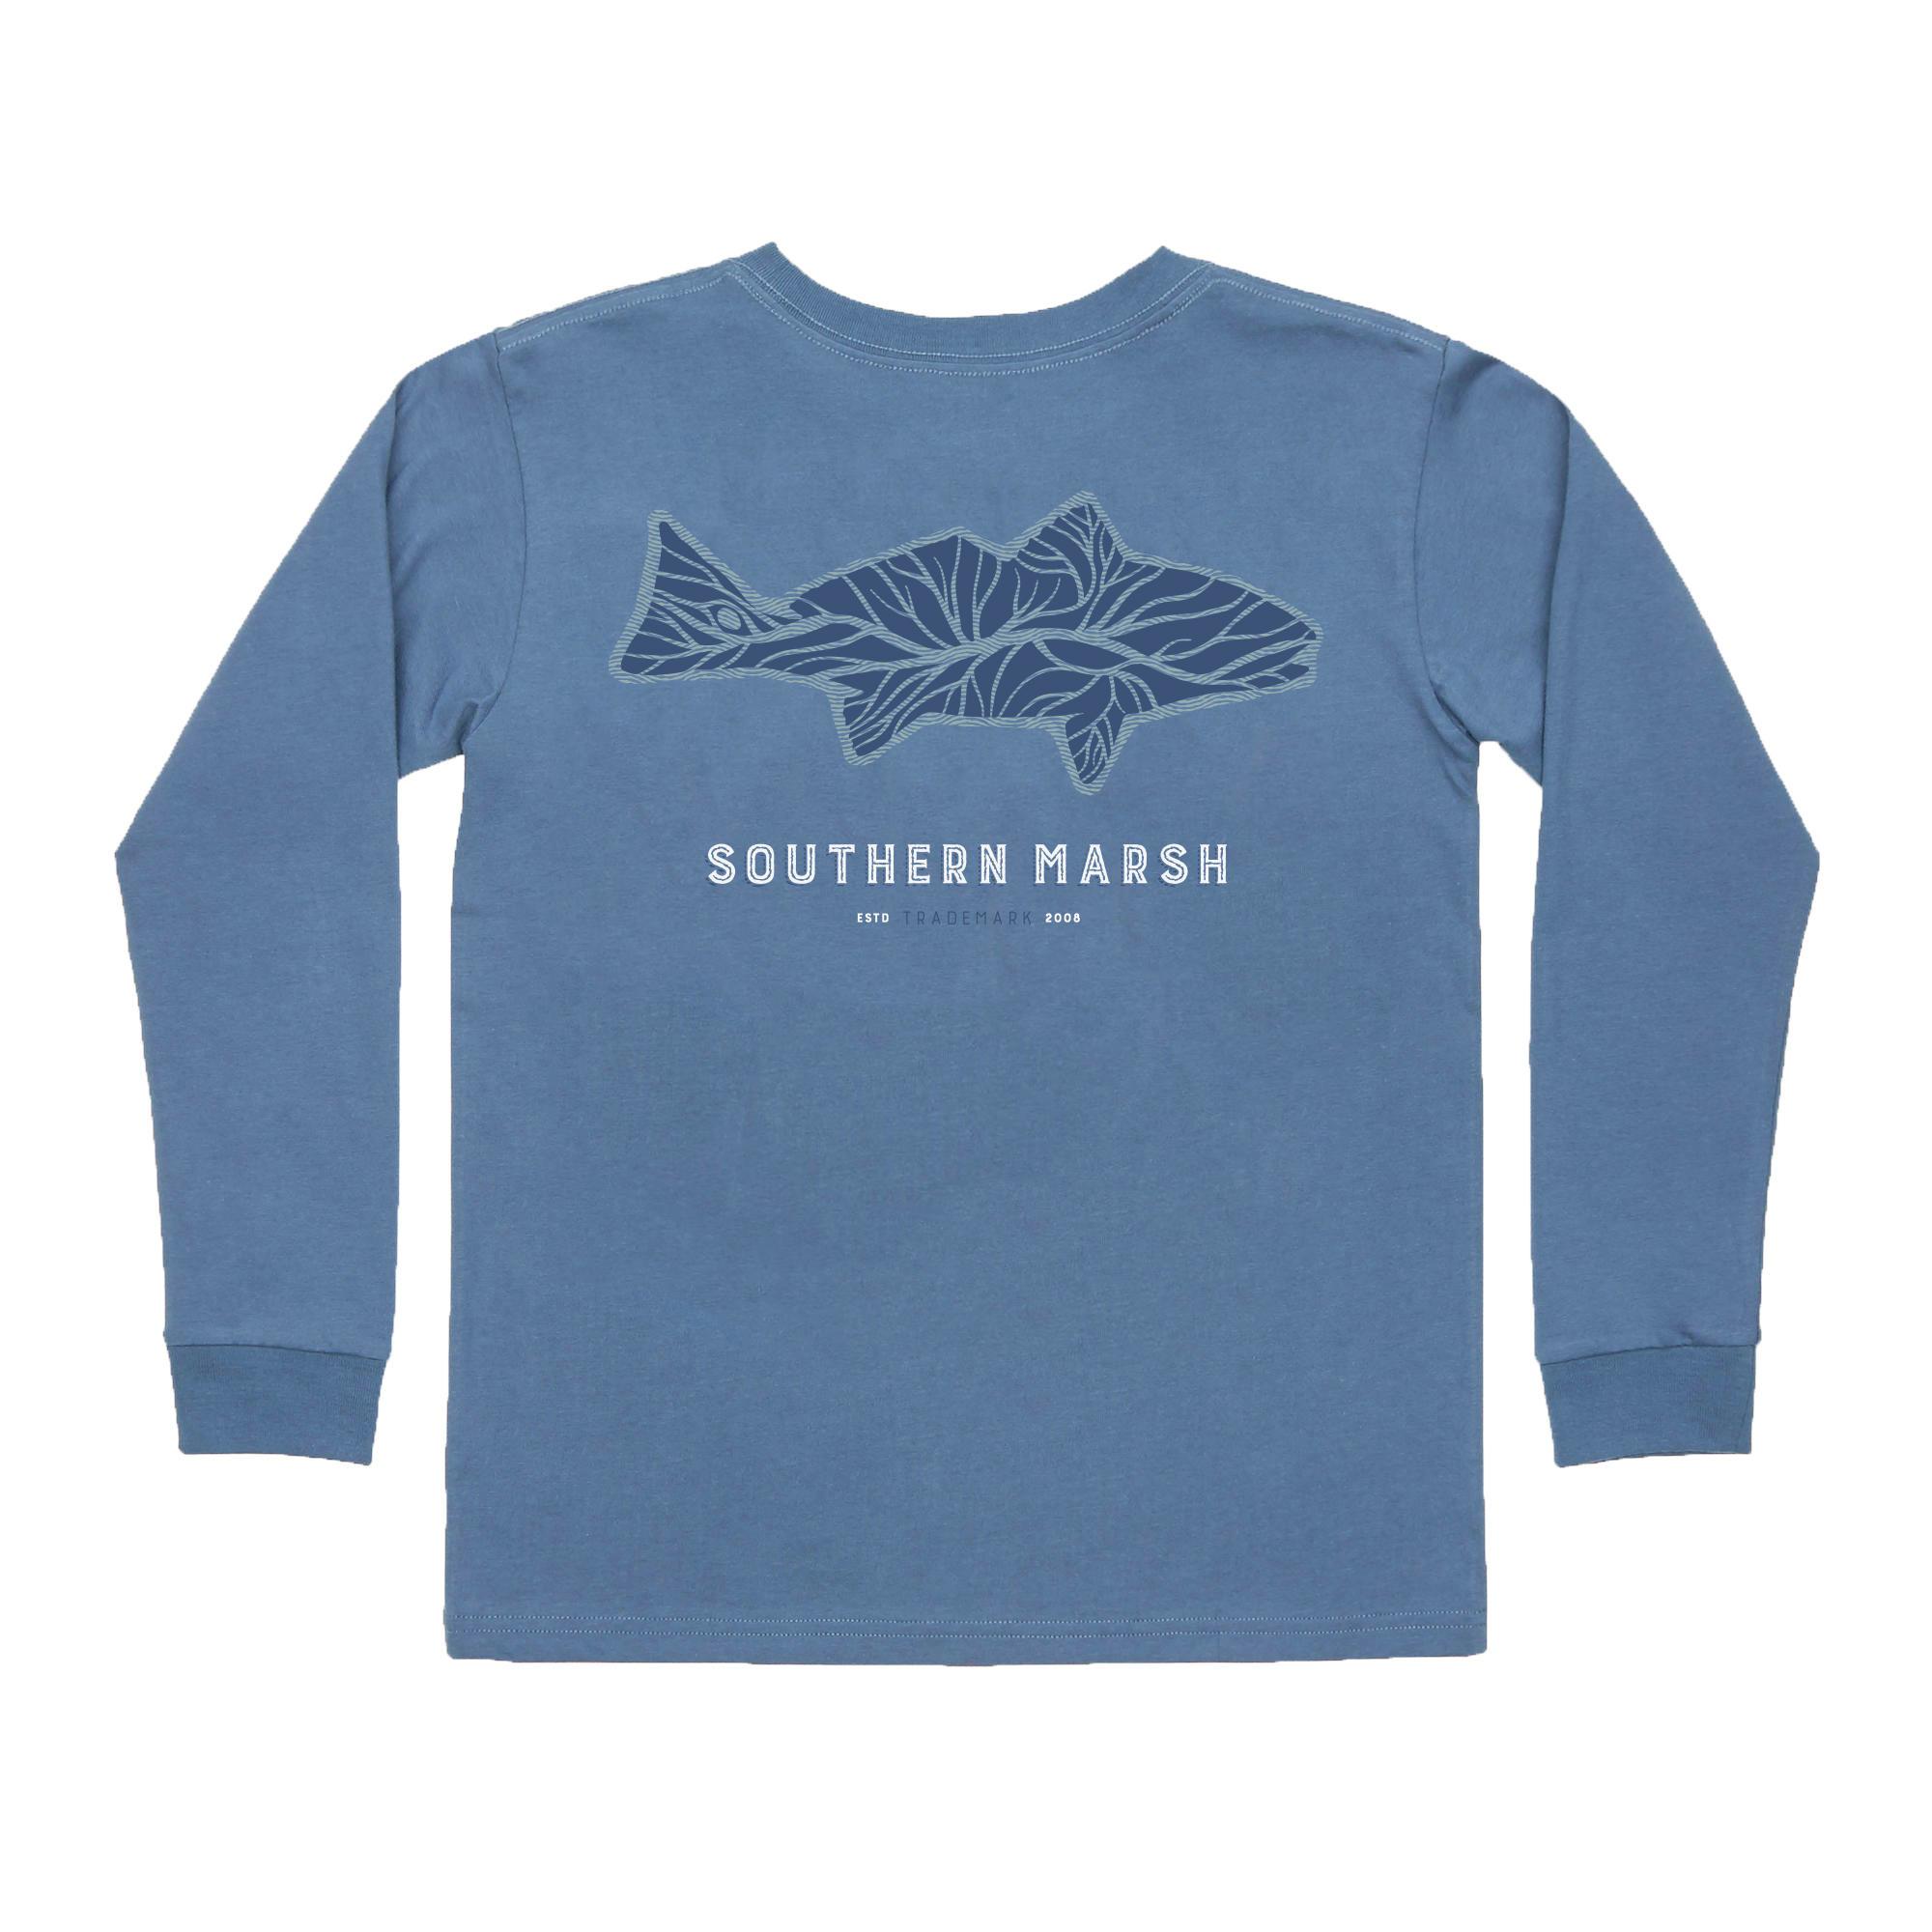 Southern Marsh Youth Delta Fish Tee - Long Sleeve